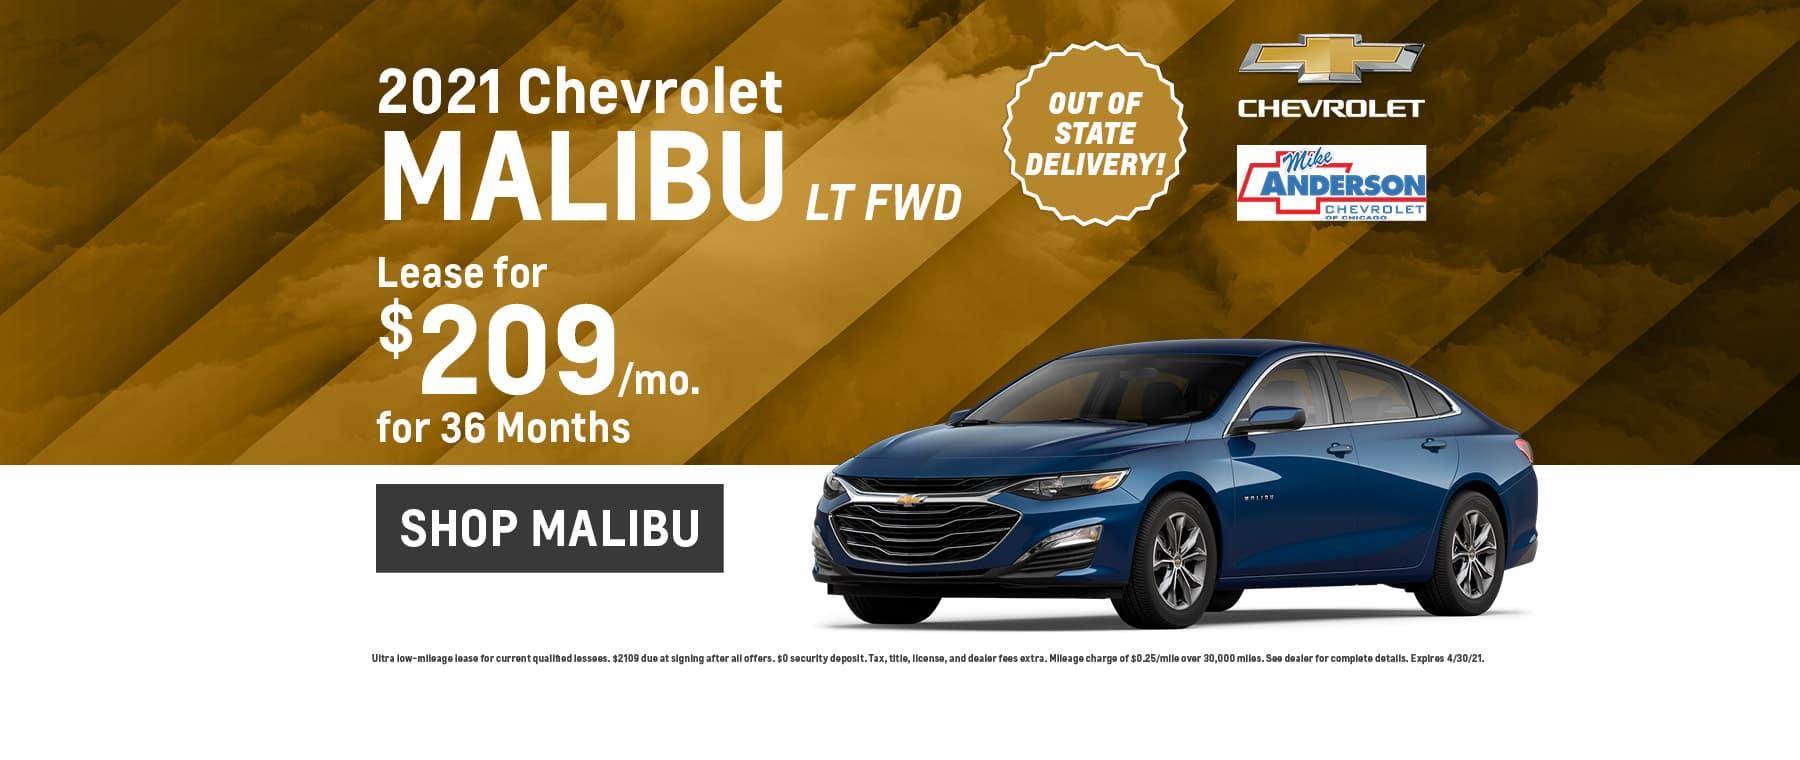 2021 Chevrolet Malibu LT FWD